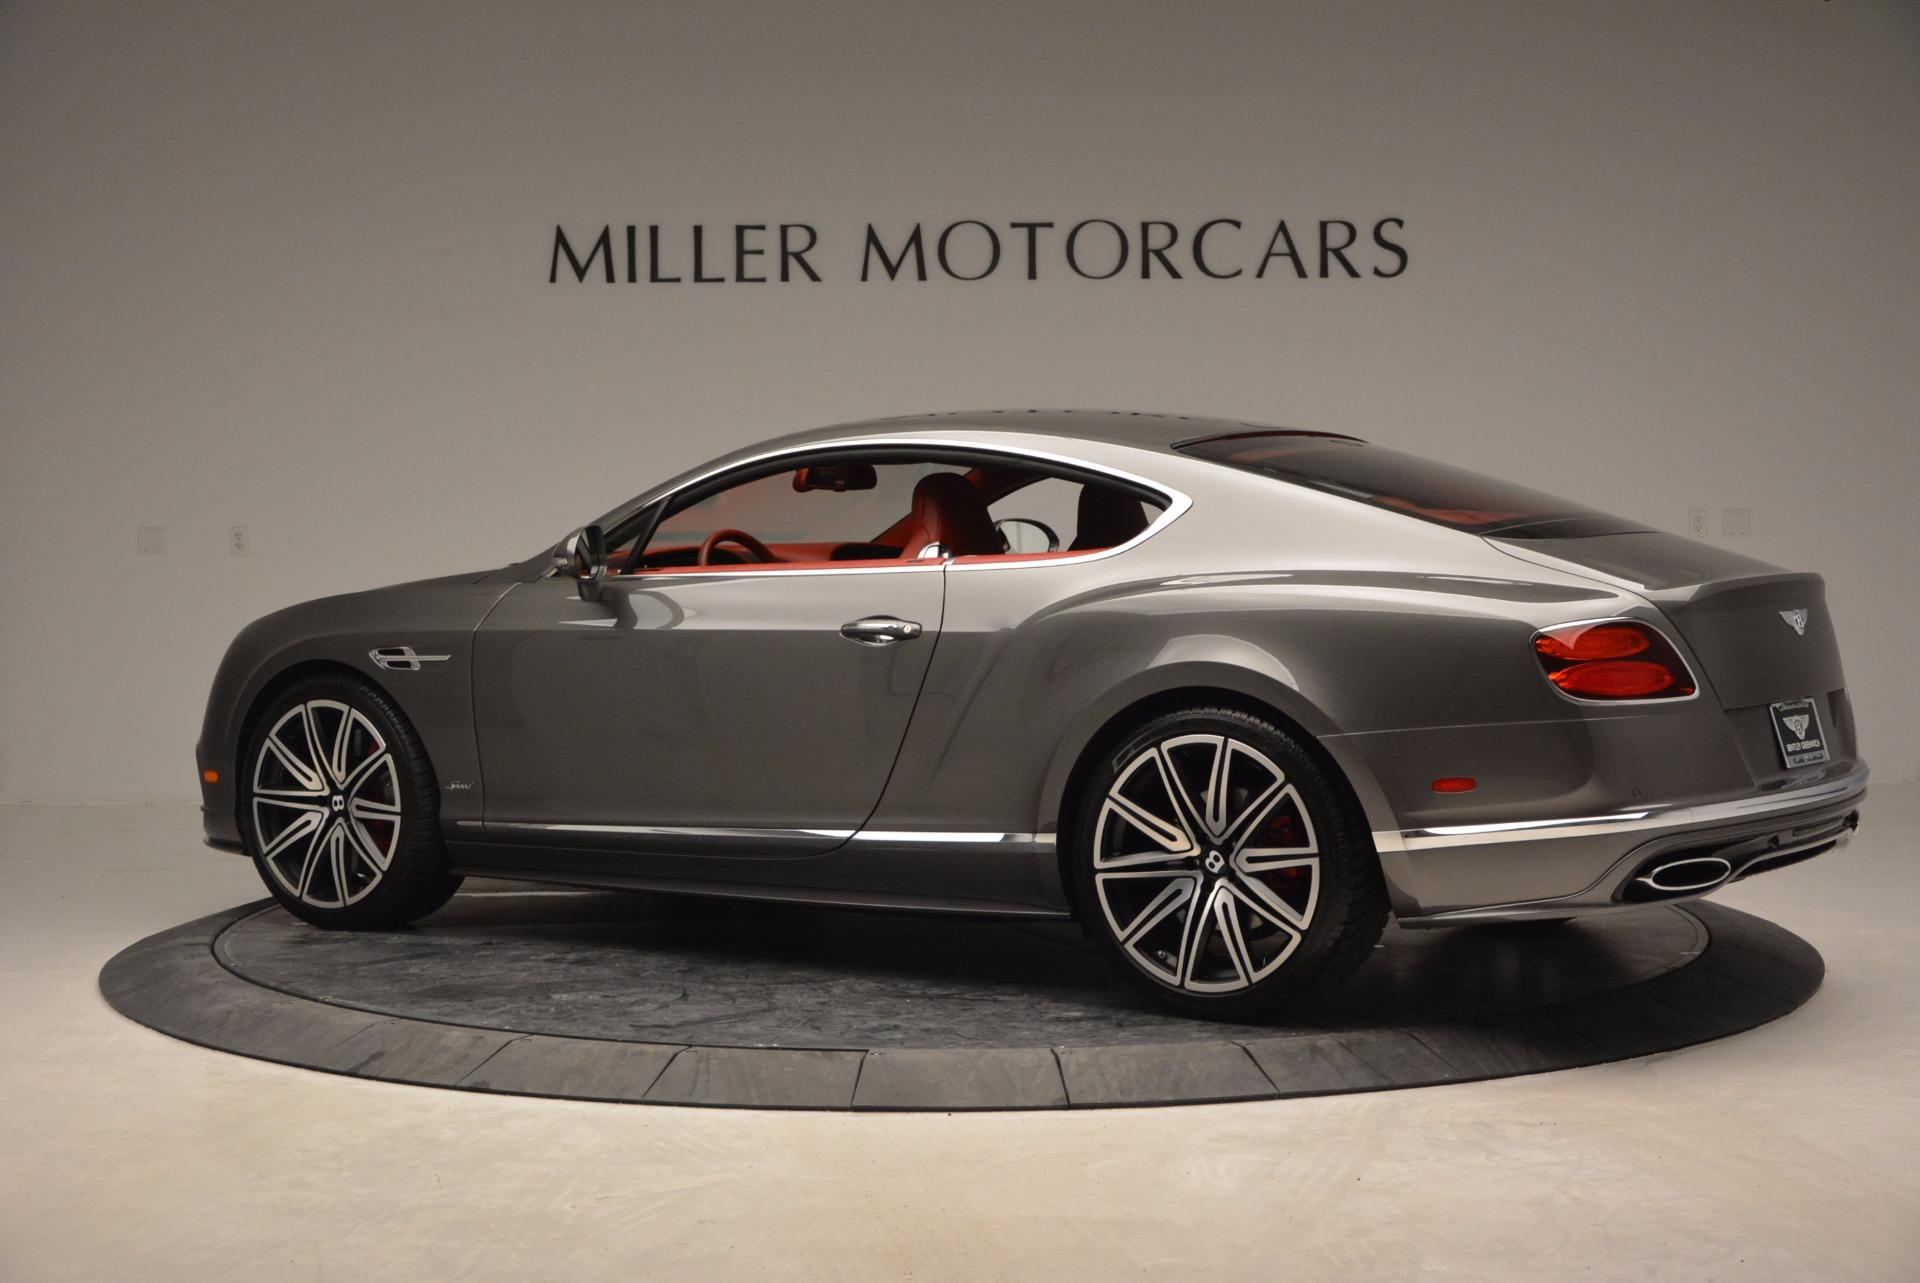 Used 2016 Bentley Continental GT Speed For Sale In Westport, CT 910_p4